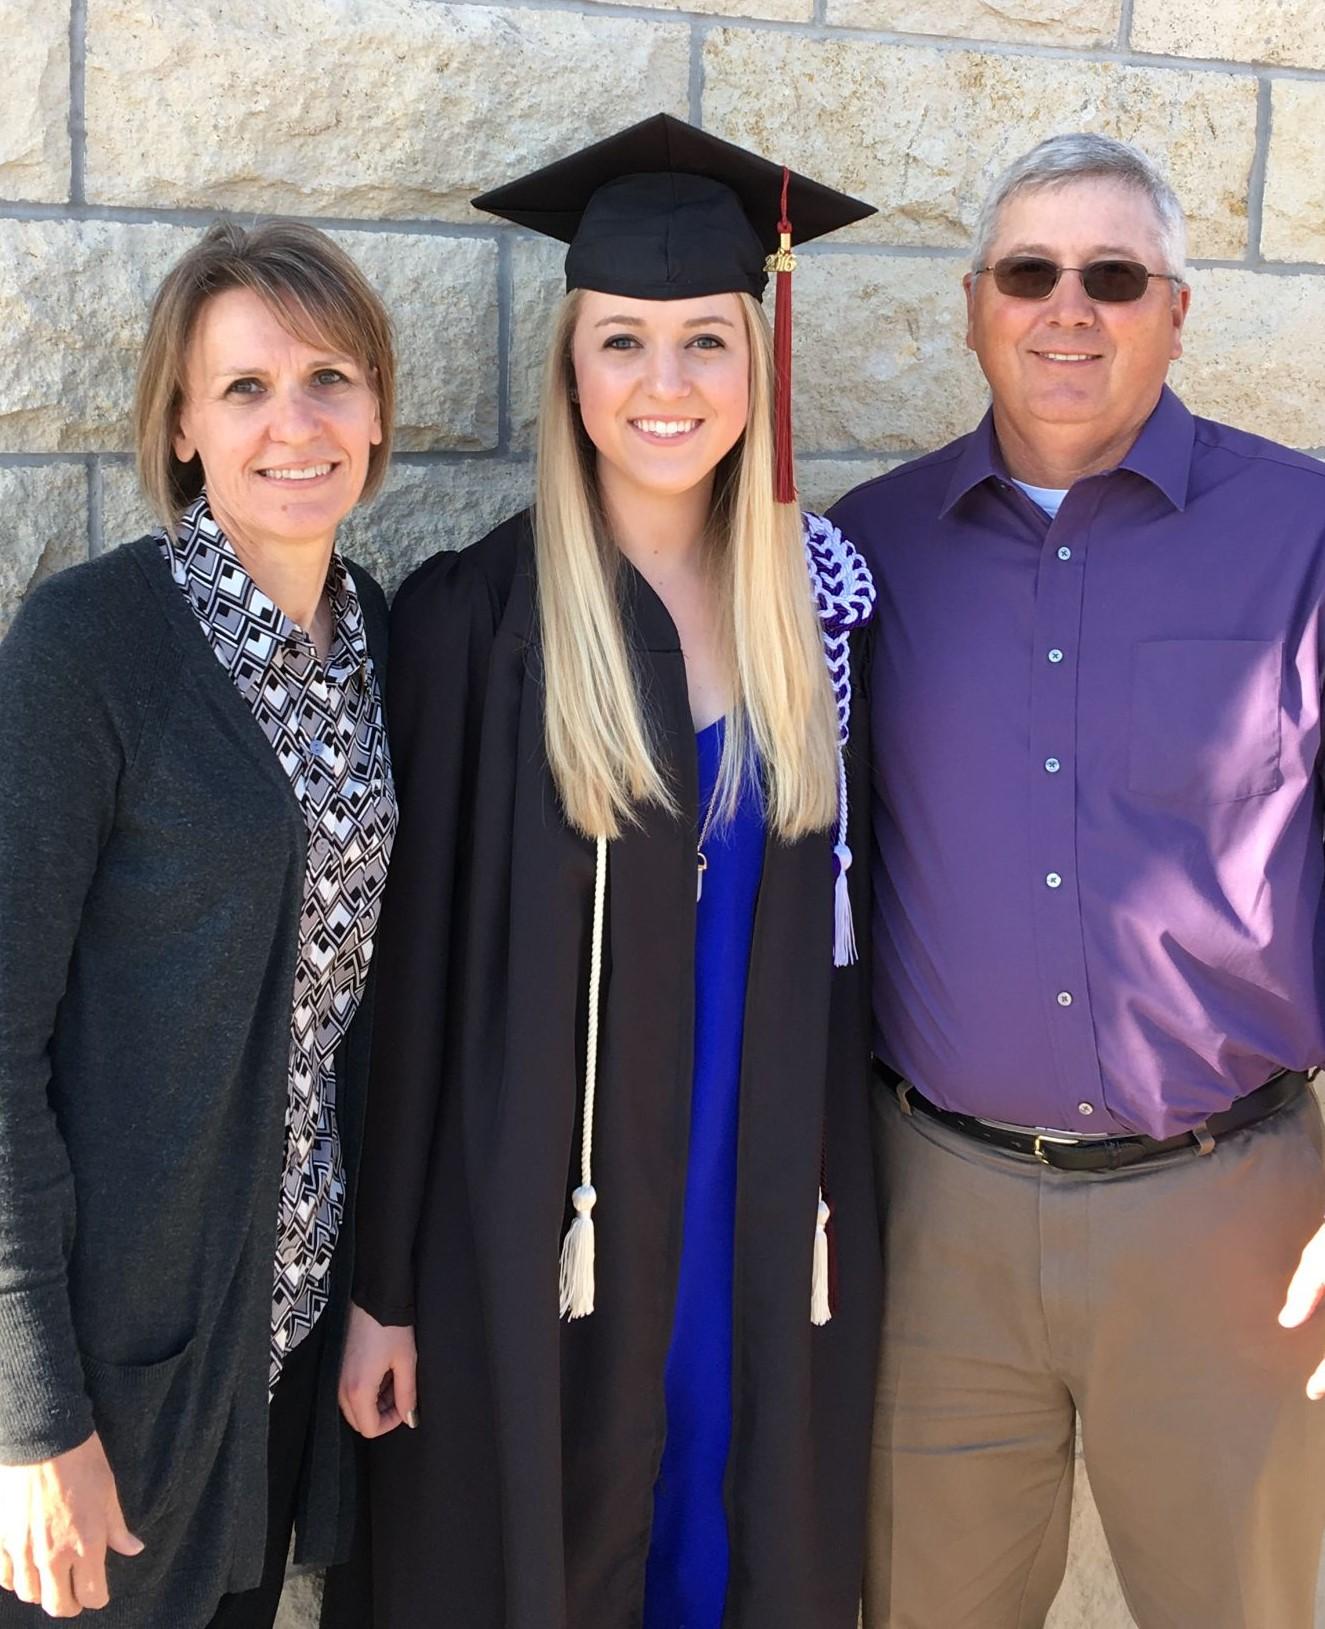 KState Graduation